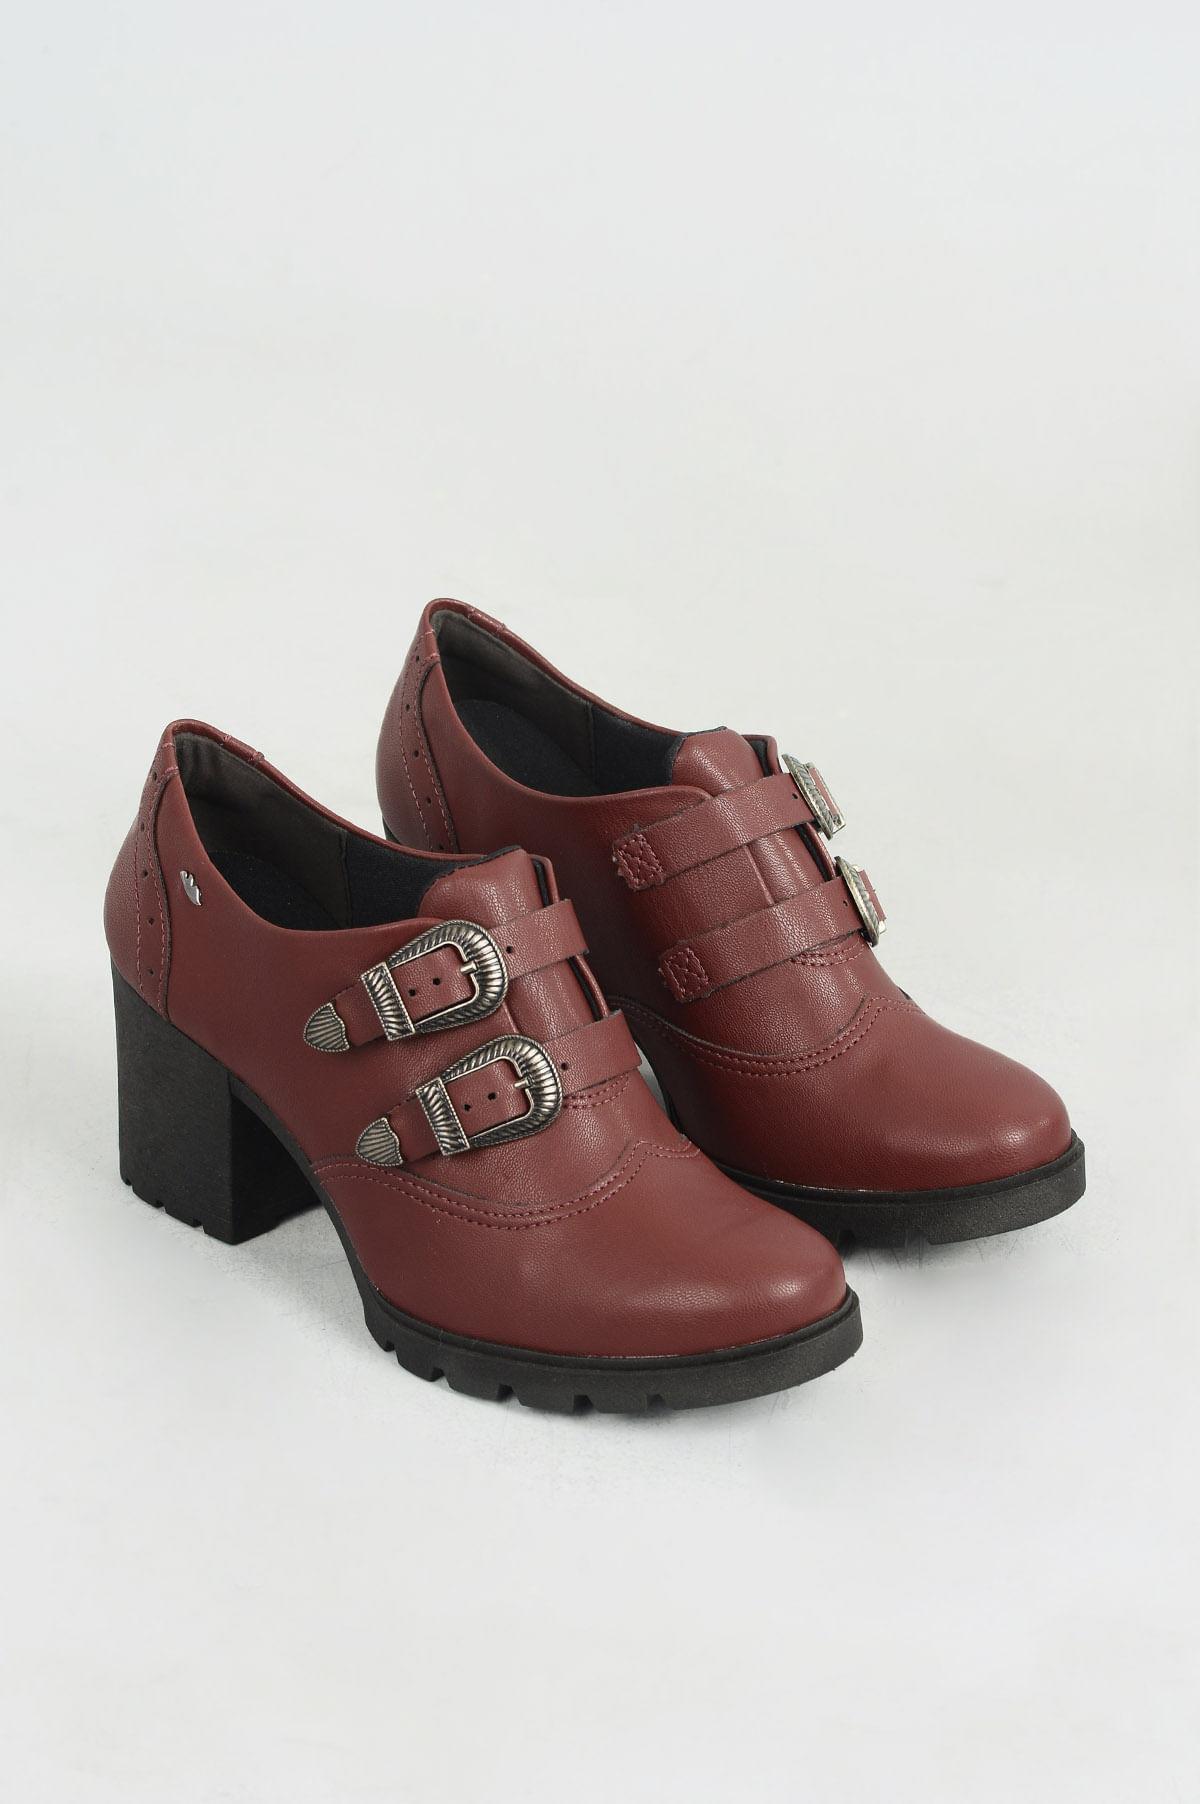 328fb1ef66 Sapato Feminino Elyana Dakota SINT - VINHO - Mundial Calçados